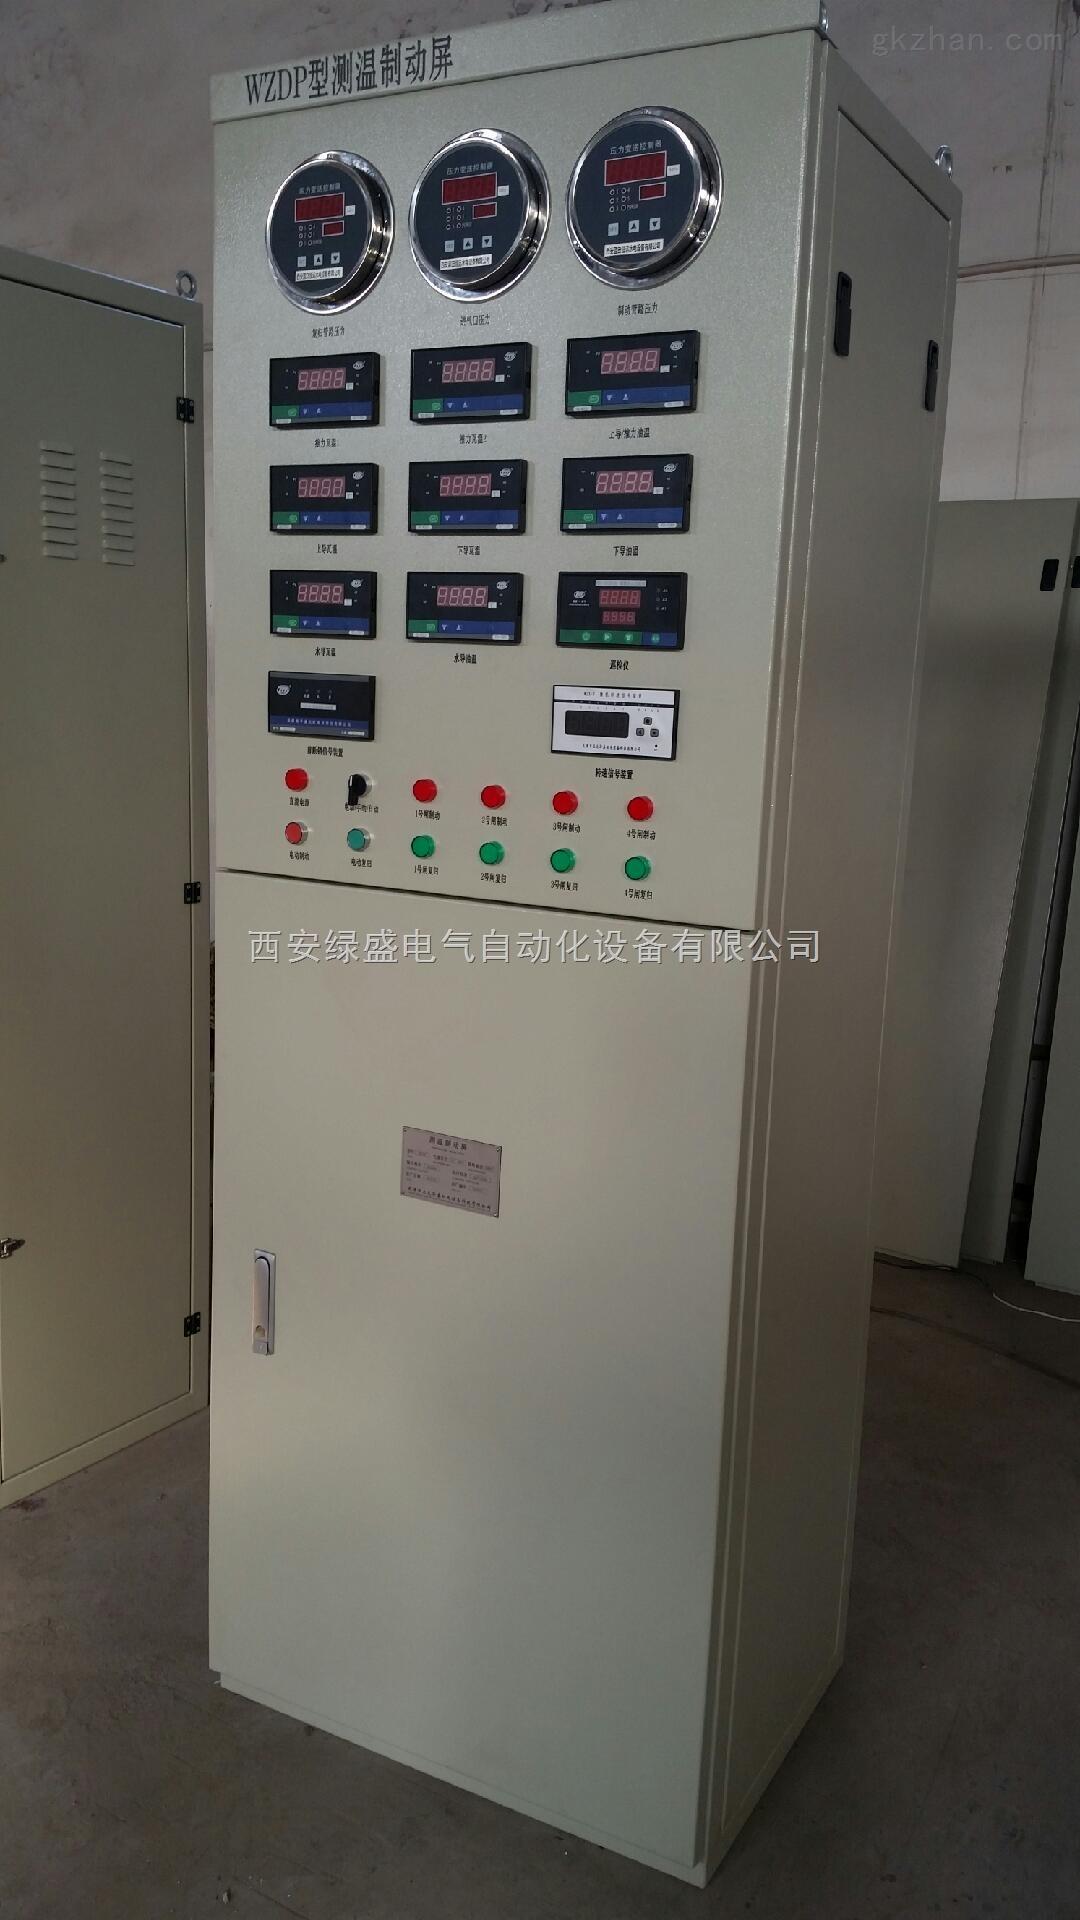 psk排水泵自动控制装置--自动控制装置